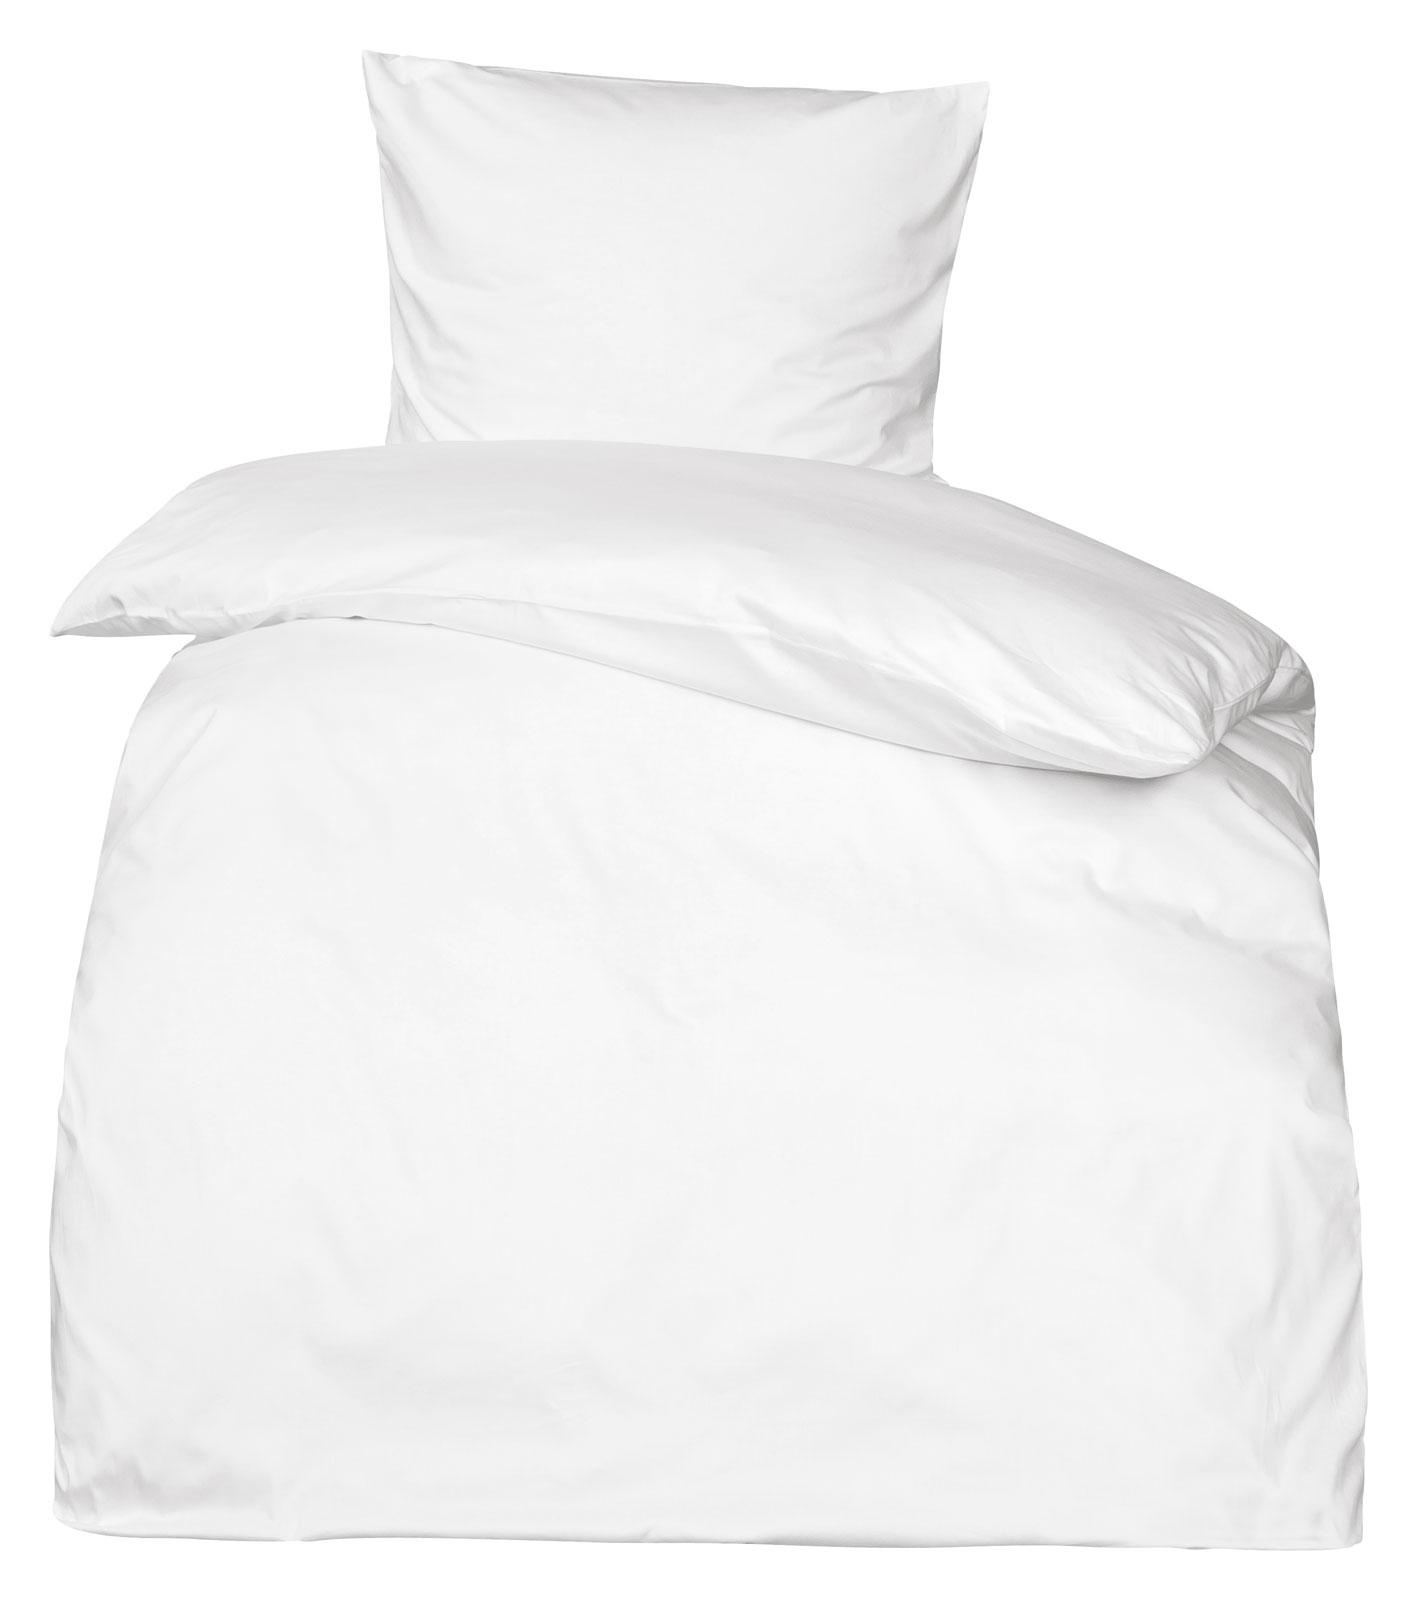 Bettwasche Uni Grun Mako Satin : Premium Mako Satin Bettwäsche uni MOON 100% Baumwolle Bettdecken